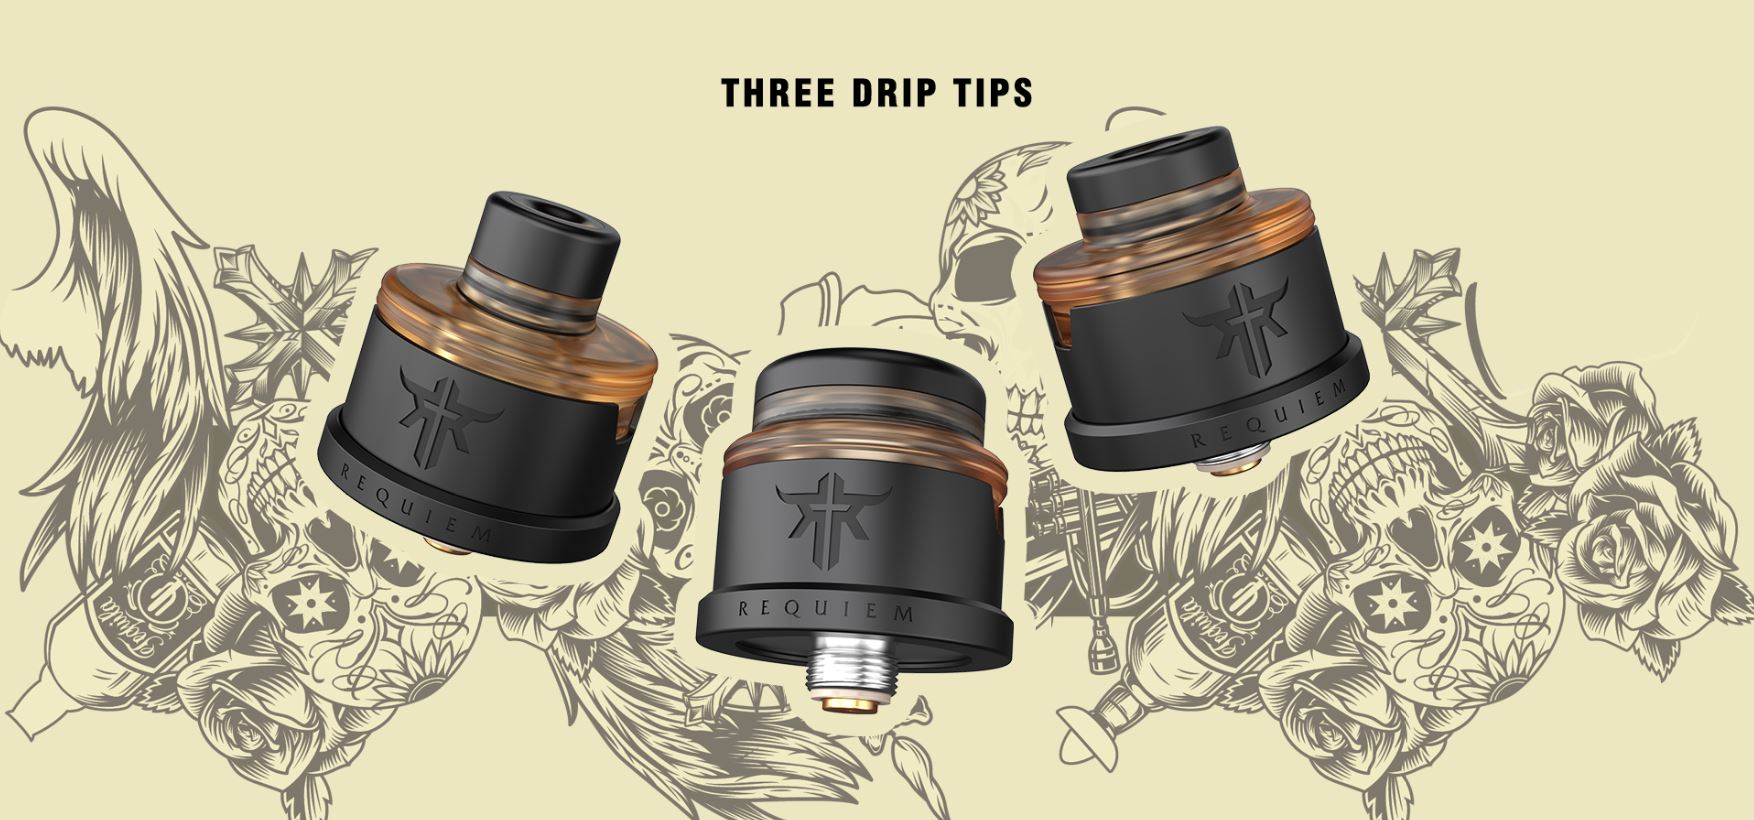 3 x Drip Tips